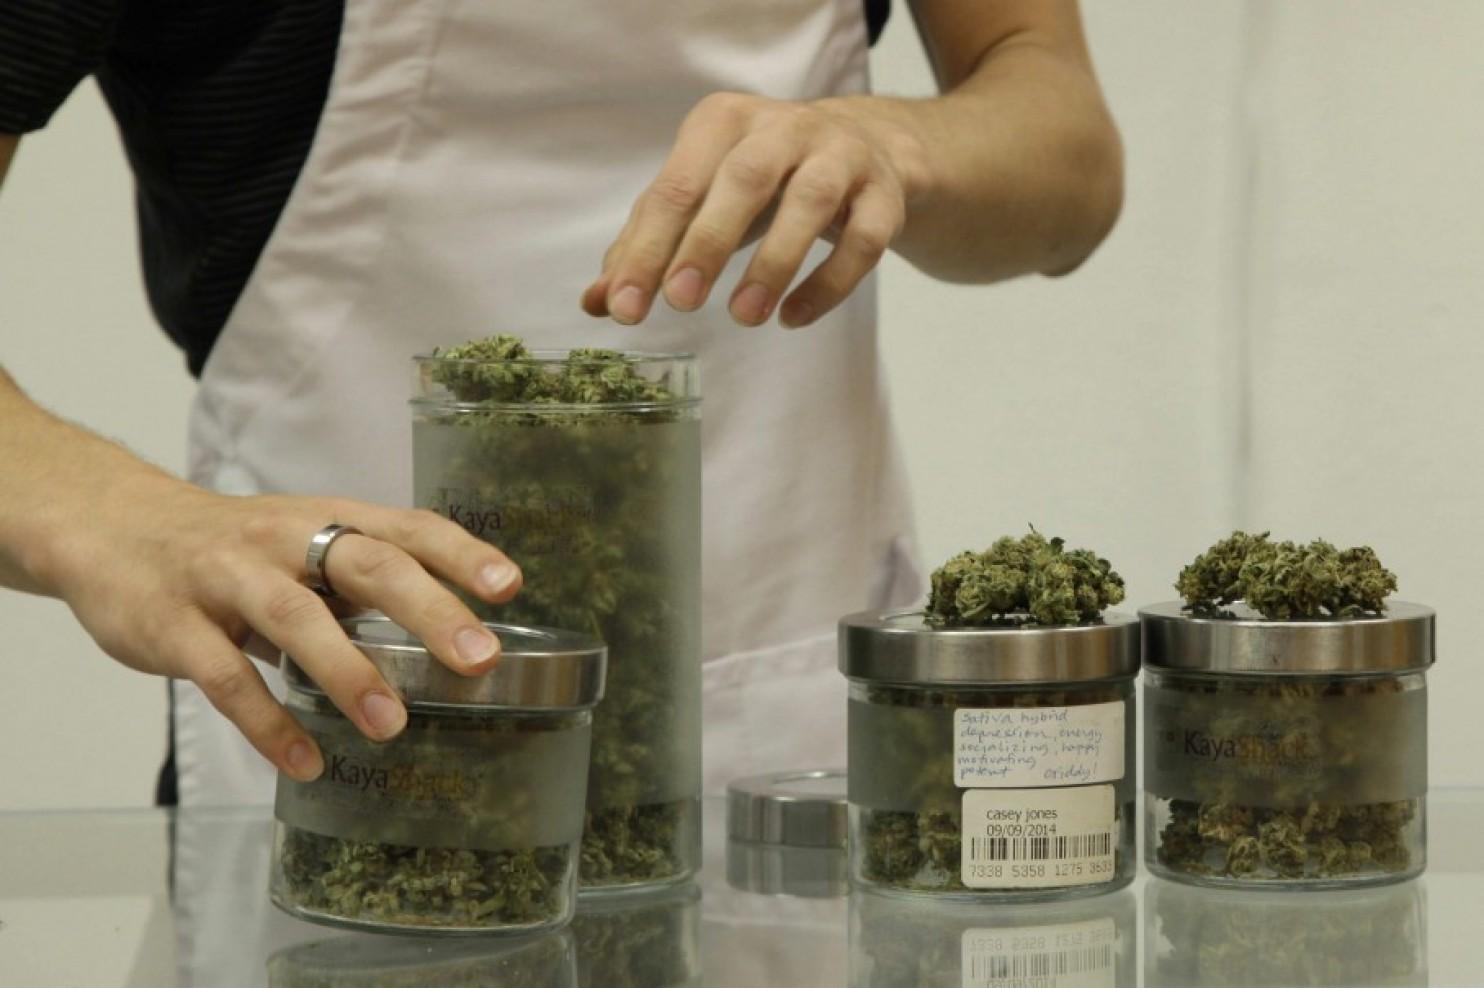 Michigan_s-Medical-Marijuana-Dispensaries-Could-Save-More-Lives